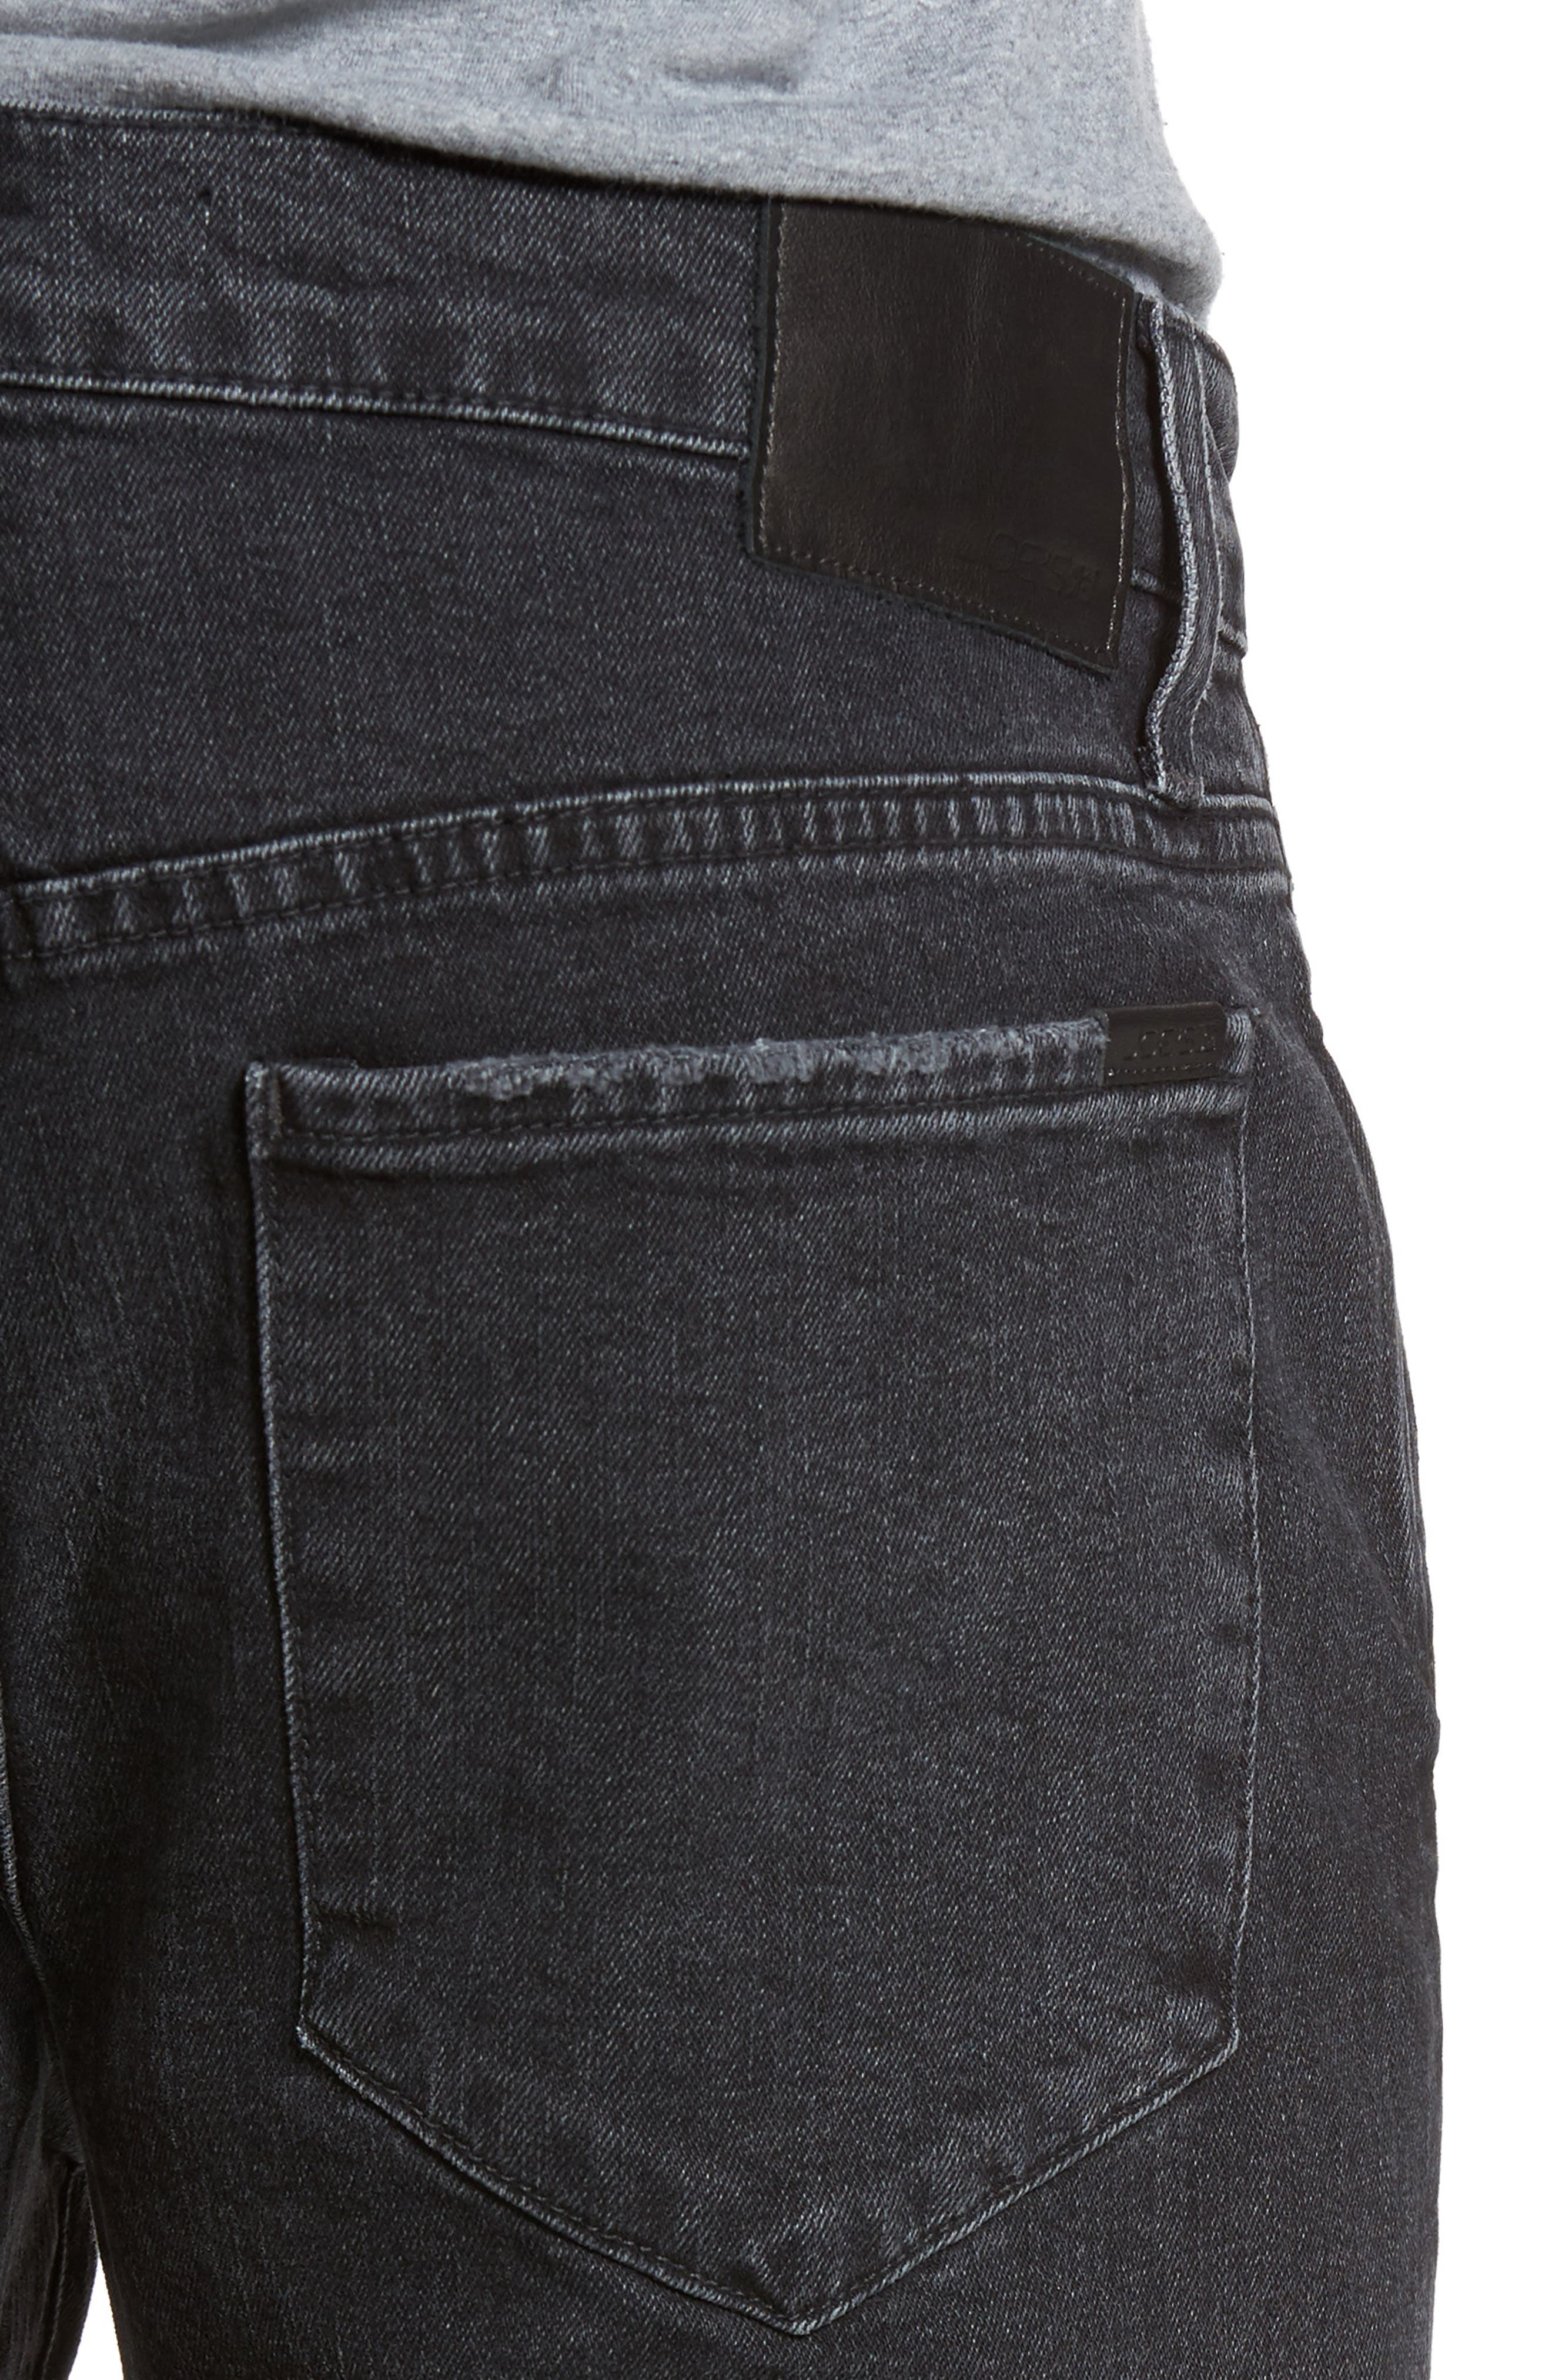 Brixton Slim Straight Fit Jeans,                             Alternate thumbnail 4, color,                             438